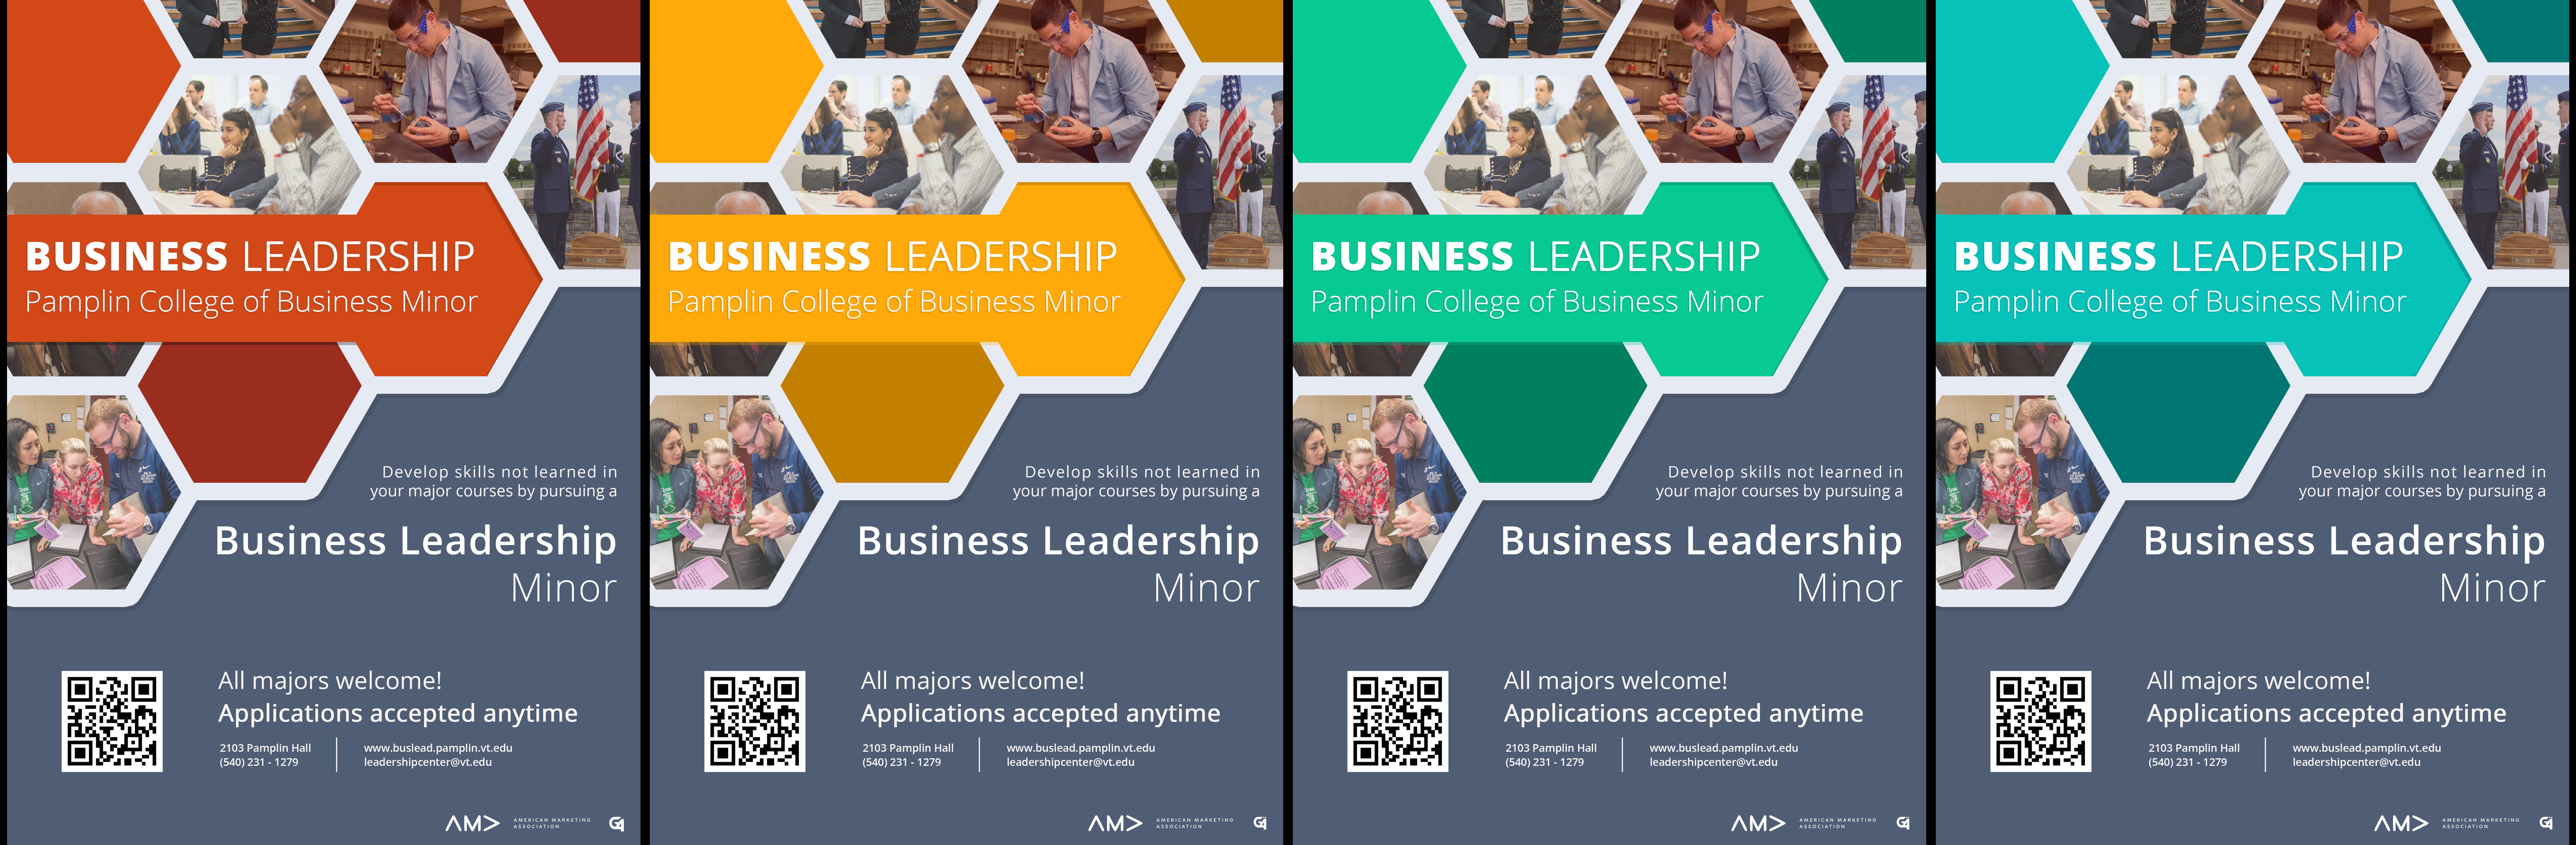 Virginia Tech - Business Leadership Minor Flyers